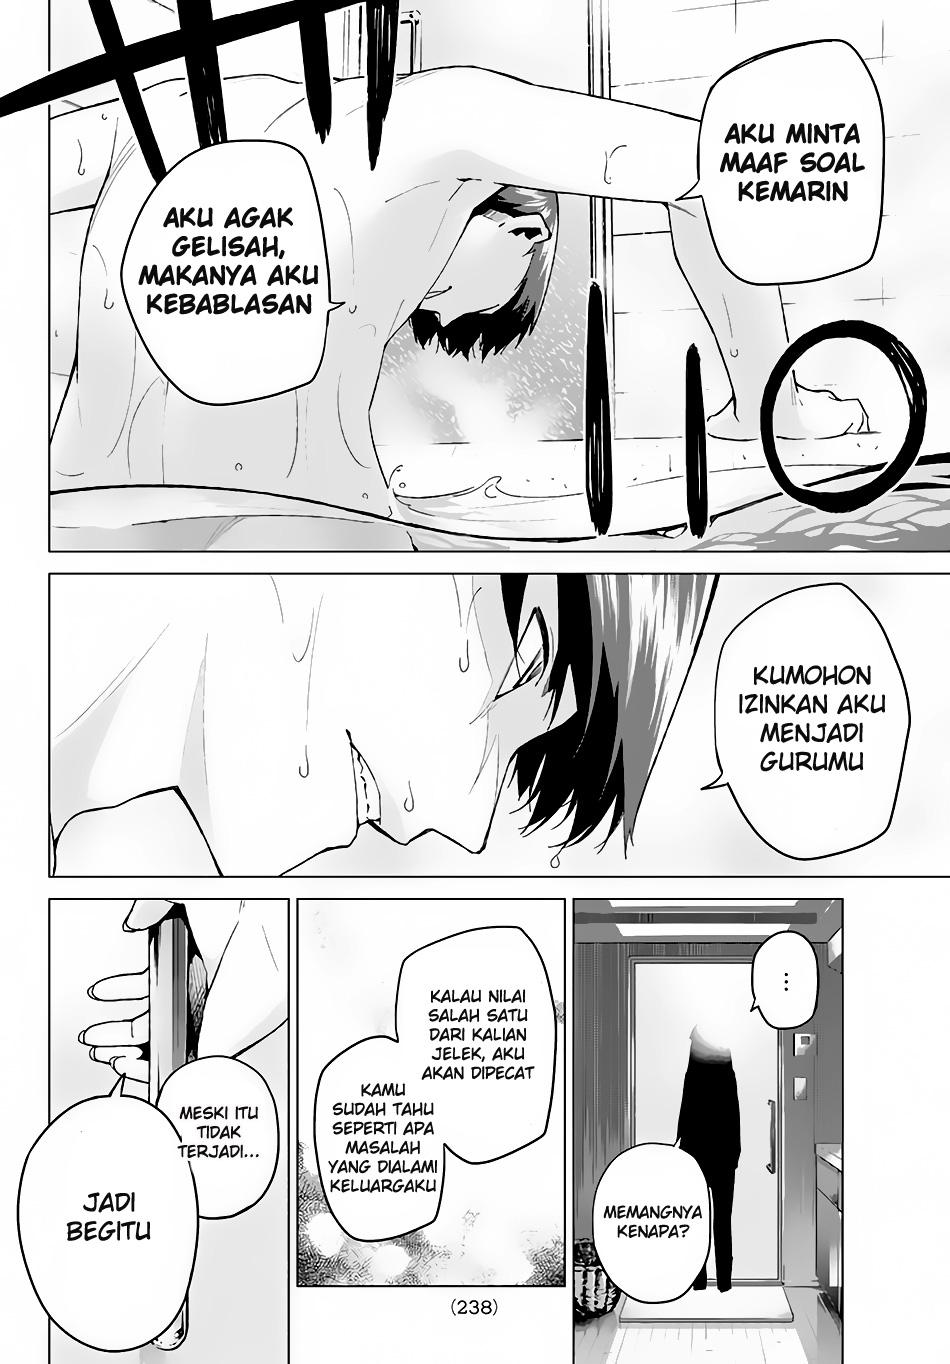 Baca Manga Go-Toubun No Hanayome Chapter 16